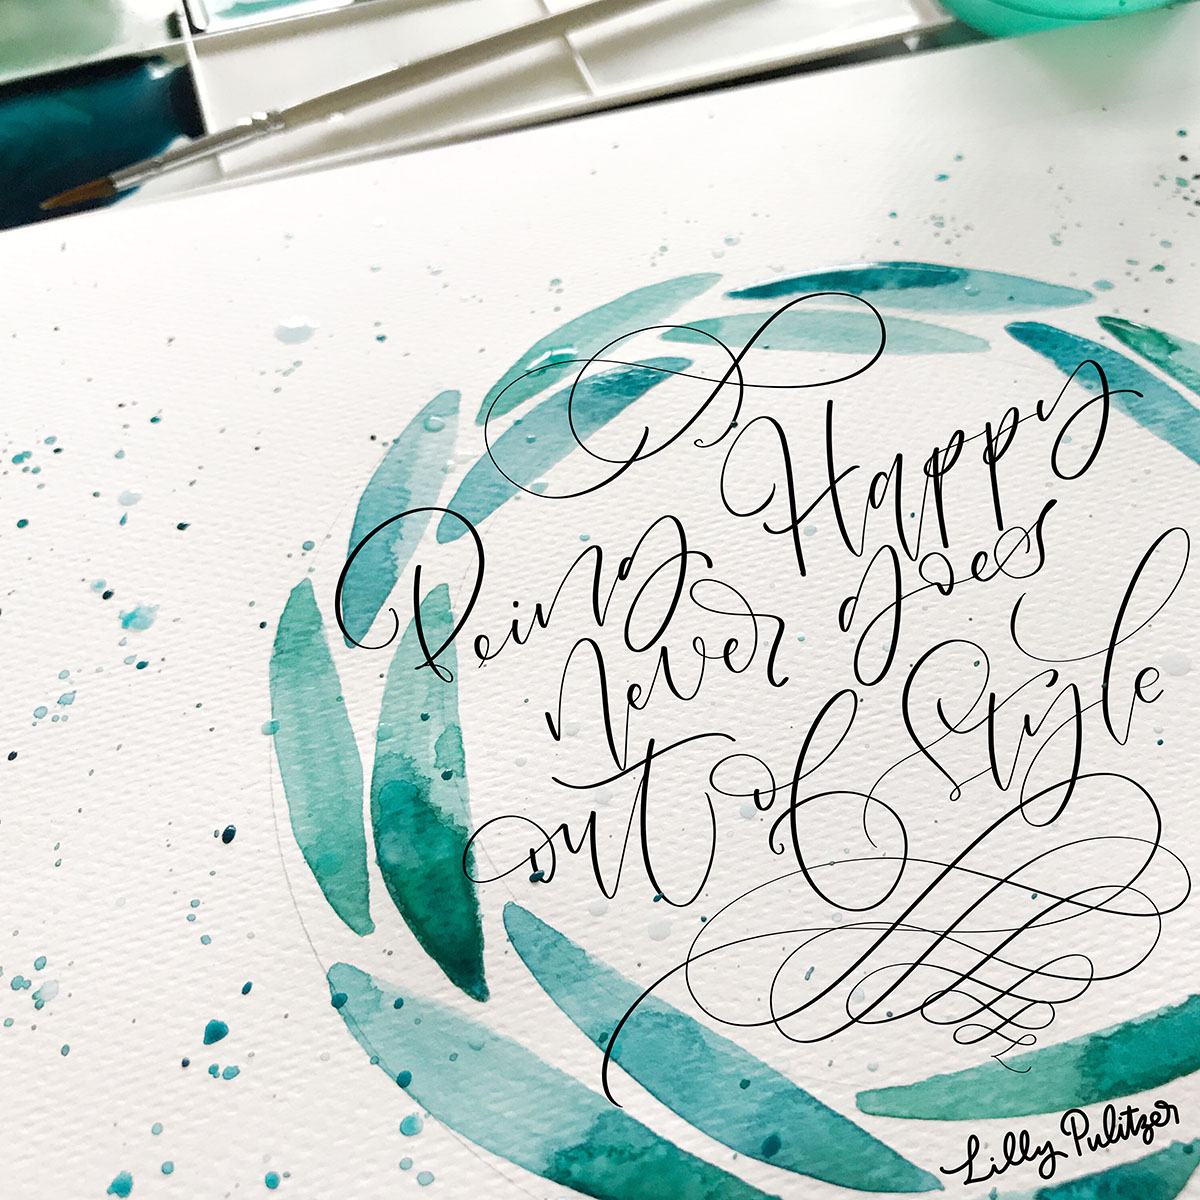 Handlettering | Brushlettering | Handlettering üben | Handlettering Workshop | Handlettering Kurs | Kalligrafie | Calligraphy